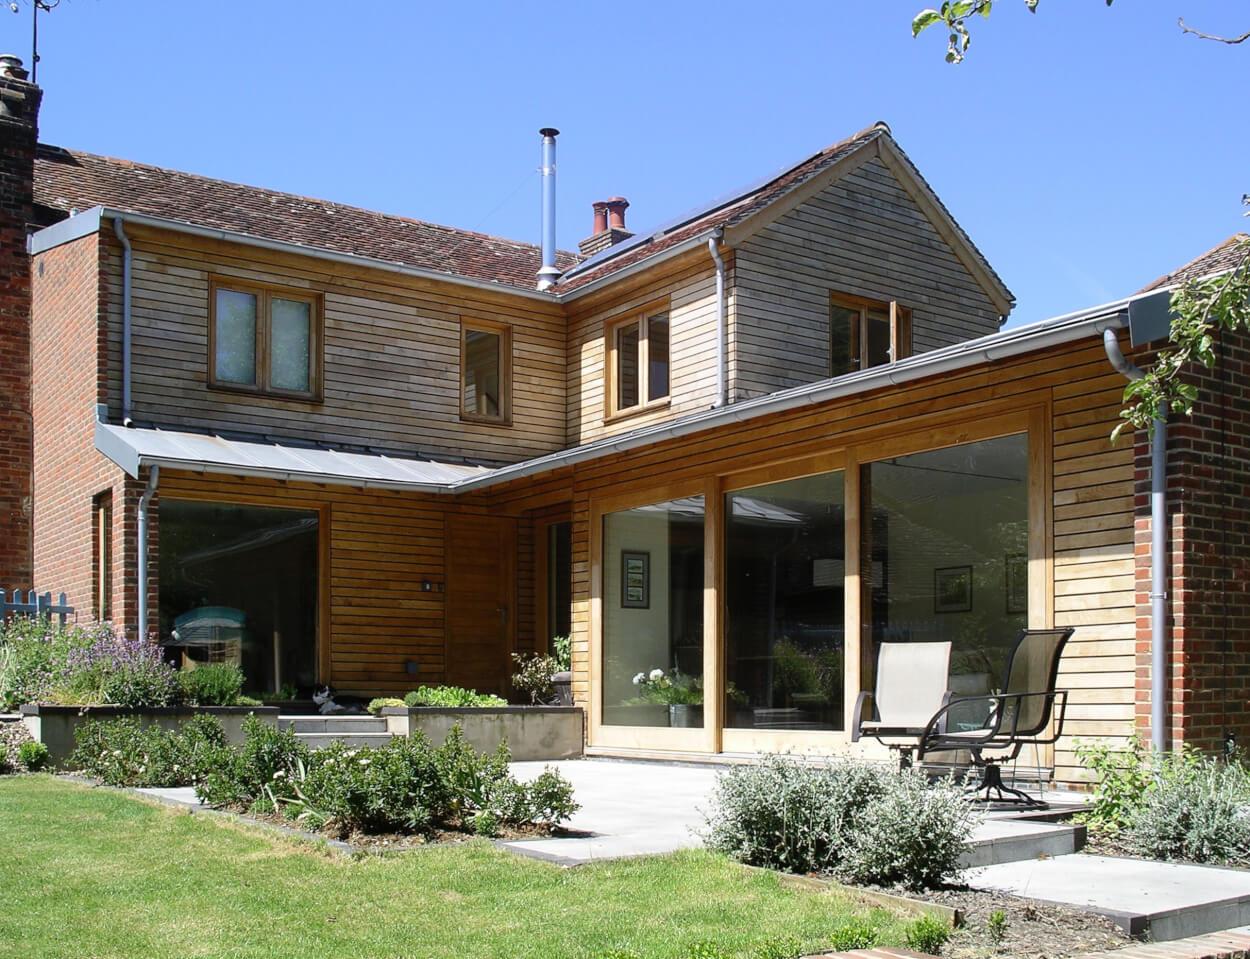 eco friendly renovation by Koru Architects